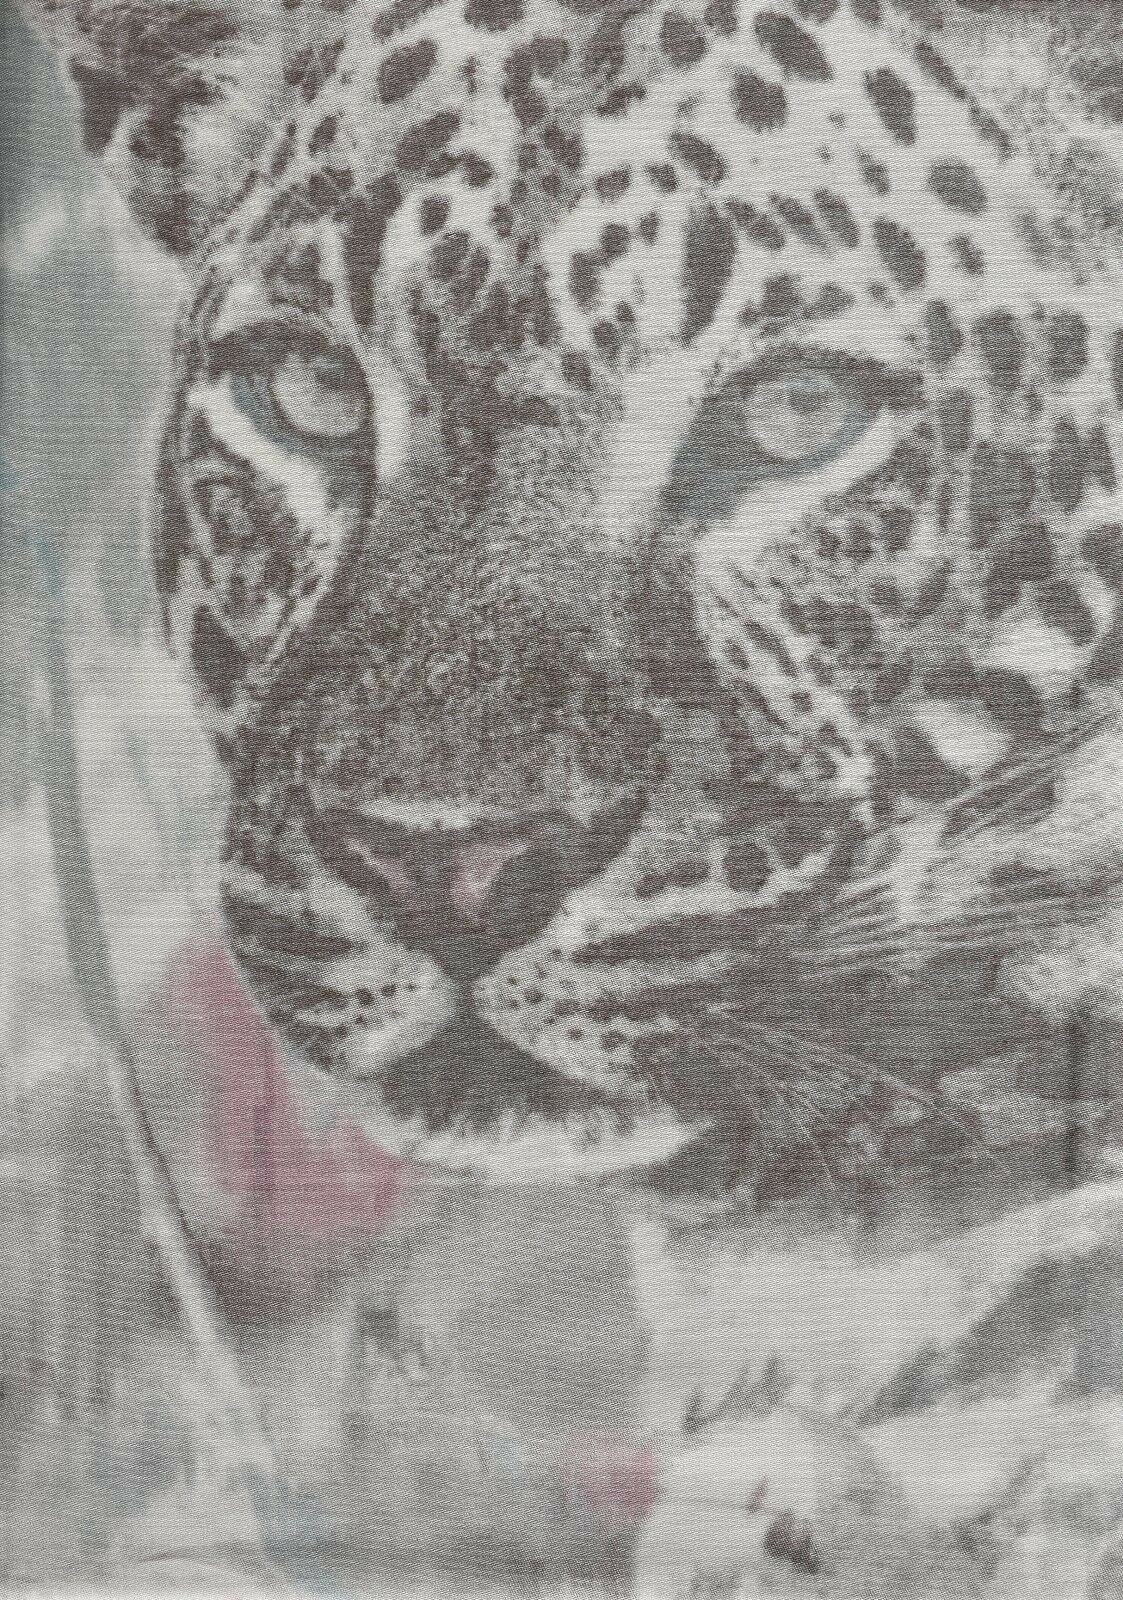 Fleuresse Bettwäsche Set 135 x x x 200 Mako Satin Baumwolle Tiere Leopard Blaumen 400a91